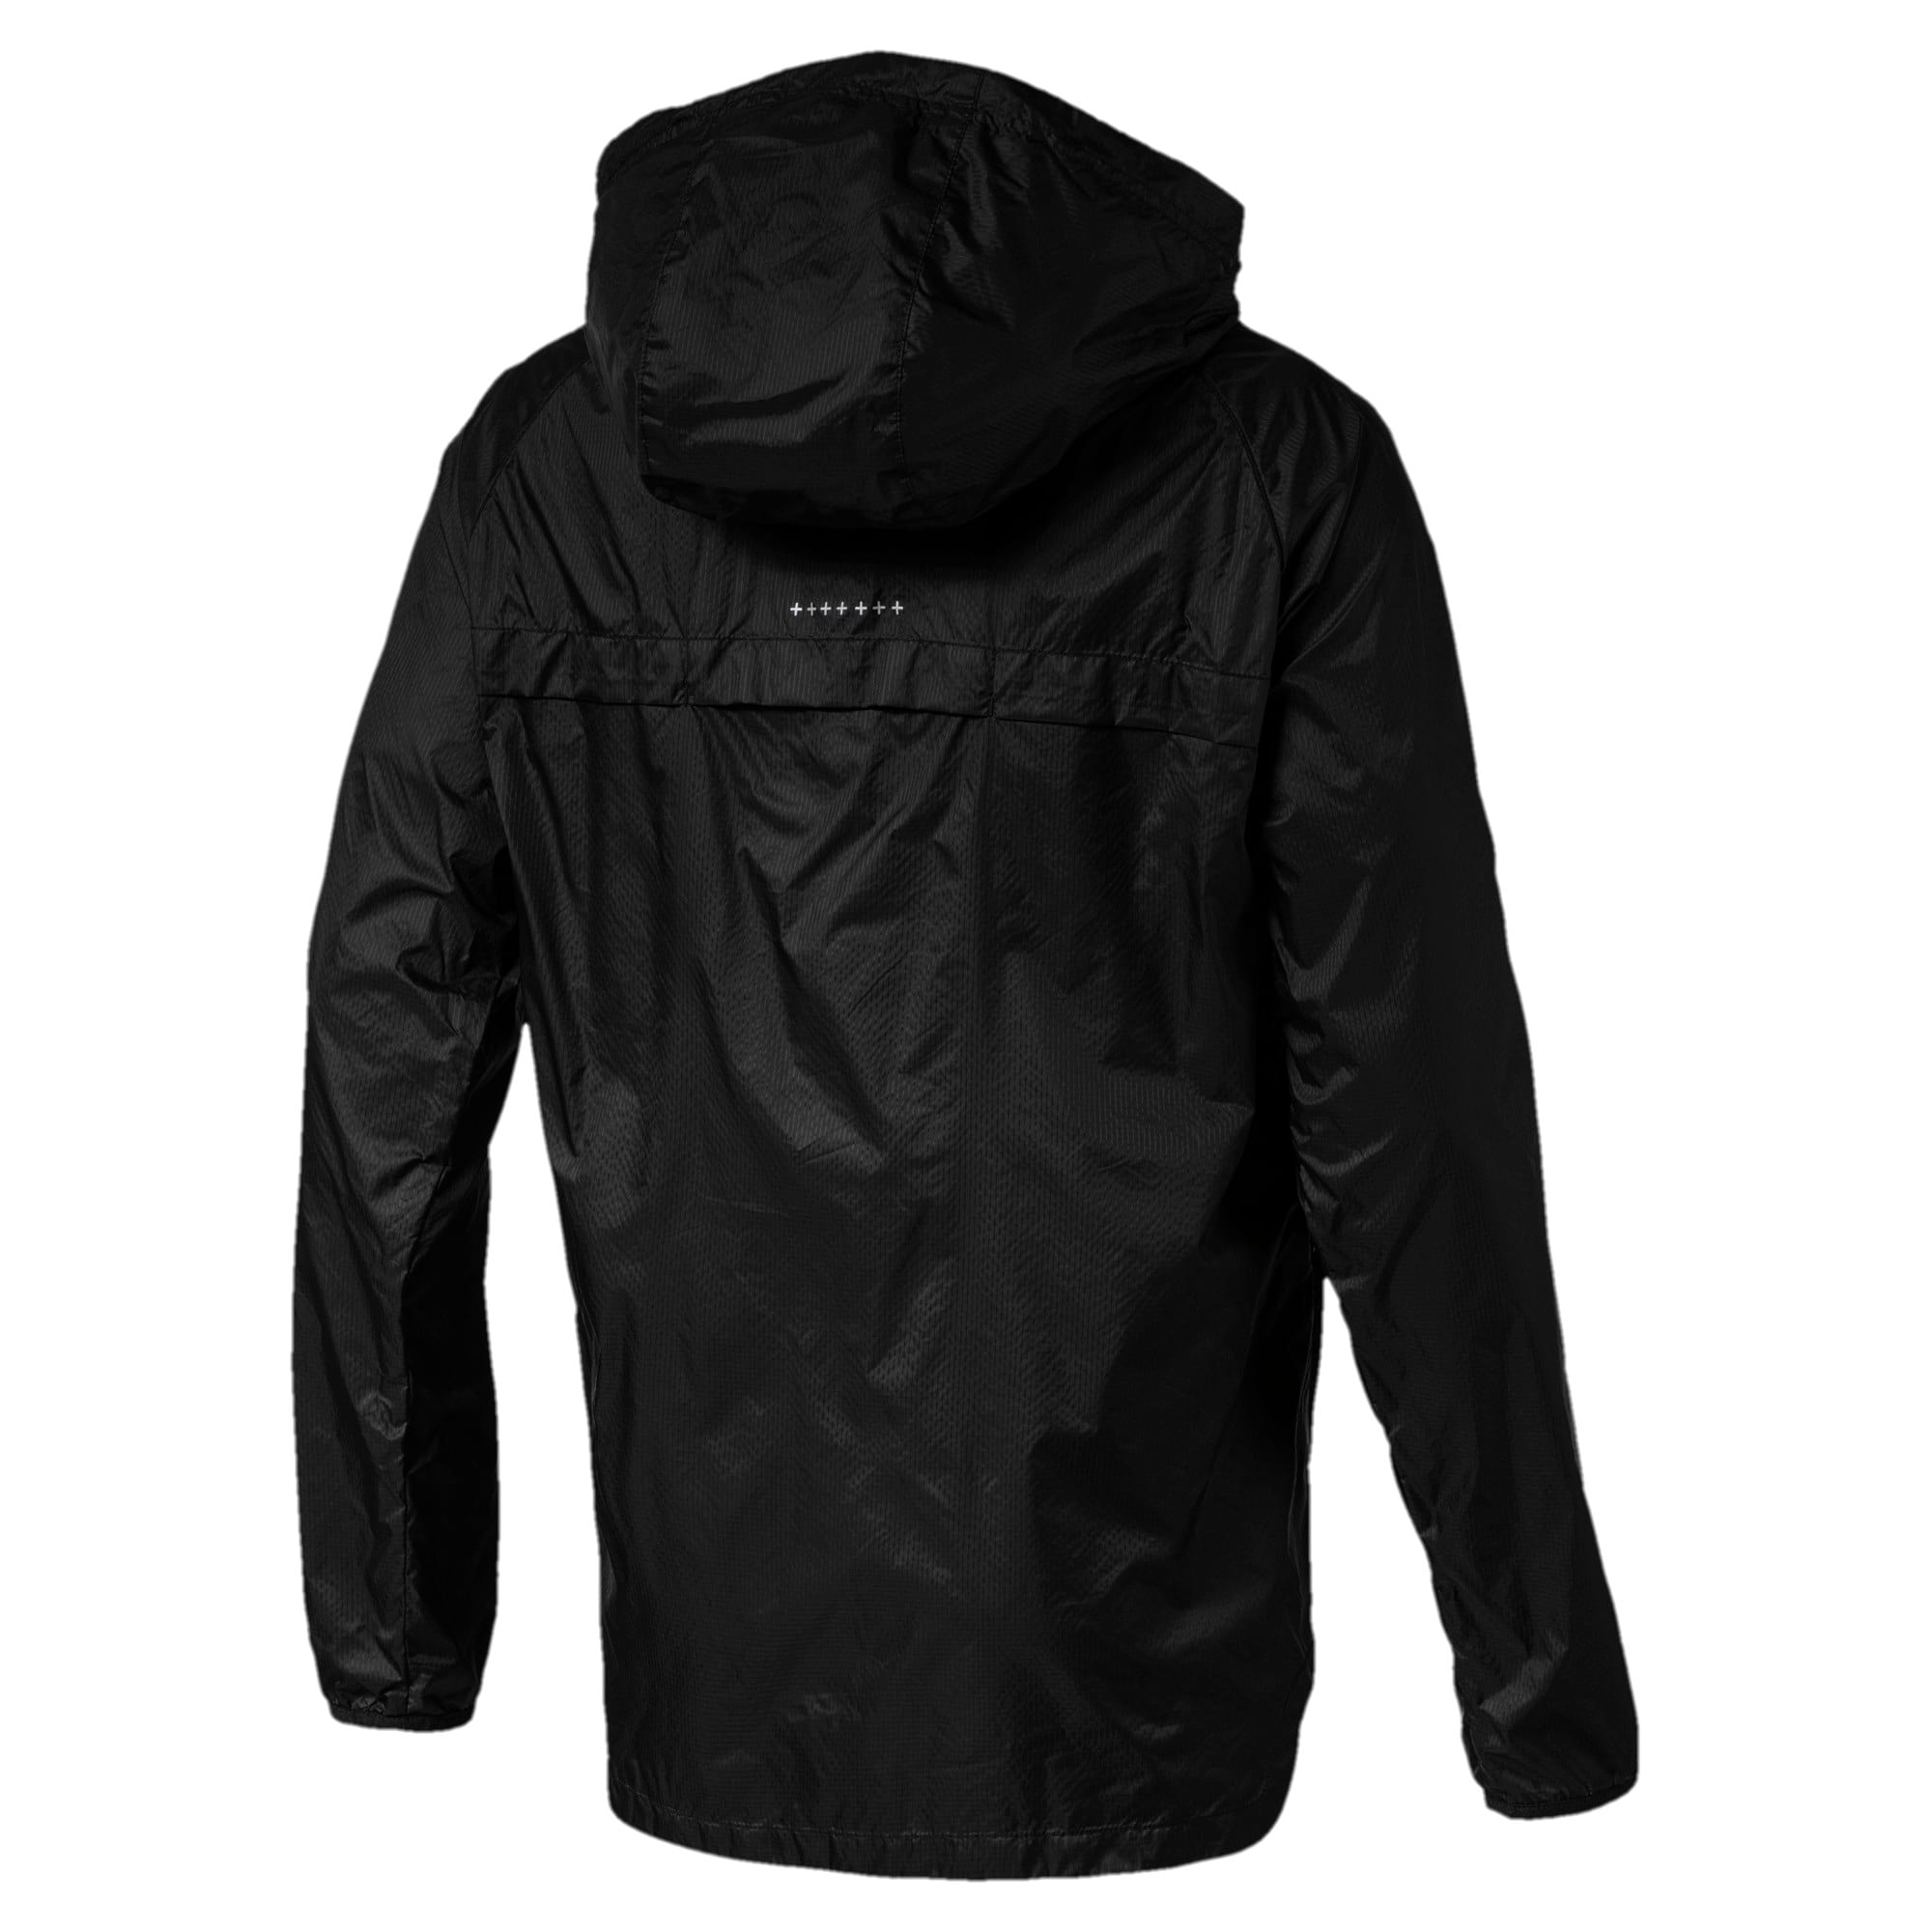 Thumbnail 3 of Lightweight Hooded Men's Jacket, Puma Black, medium